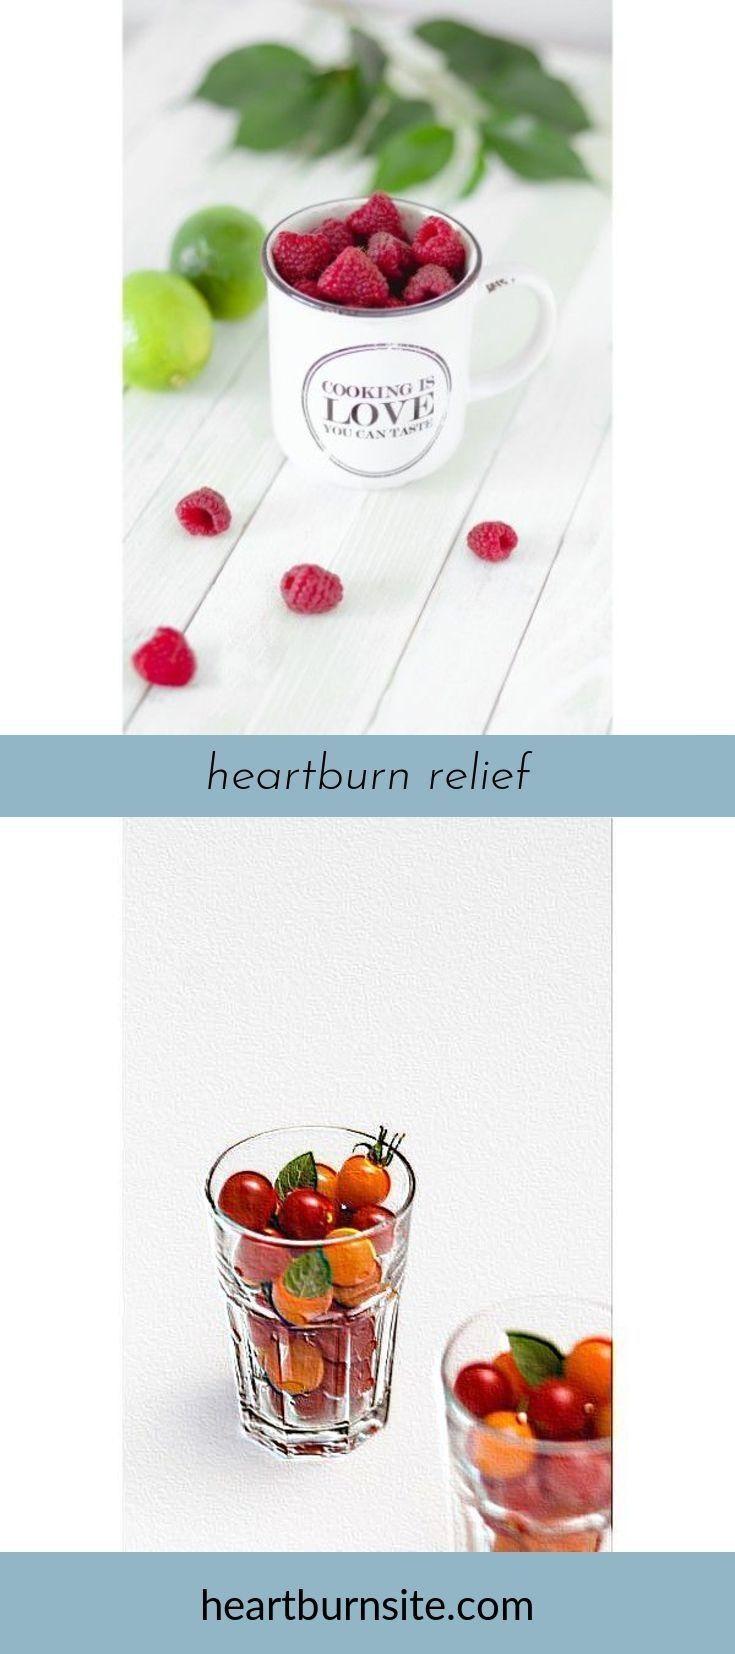 does milk help heartburn # #heartburnhelp | heartburn help